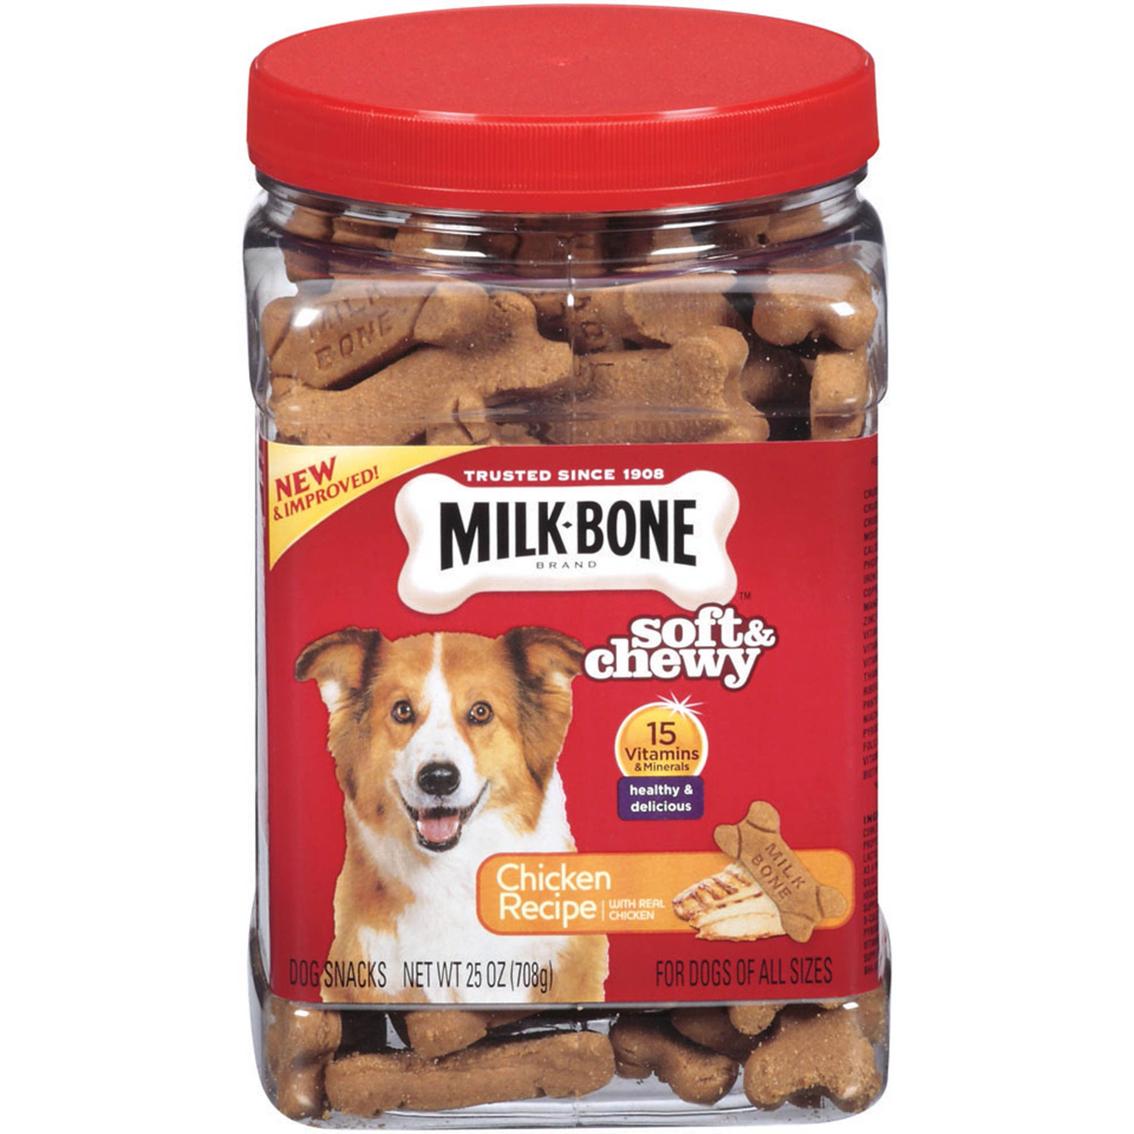 Back Labels Of Dog Treats